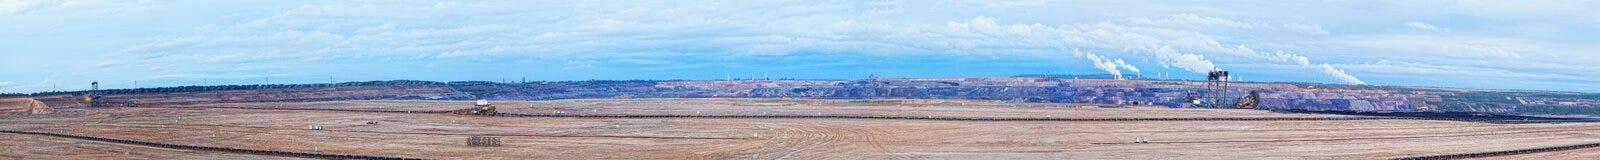 Großes Panorama einer geöffneten Kohlegrube Stockfotos